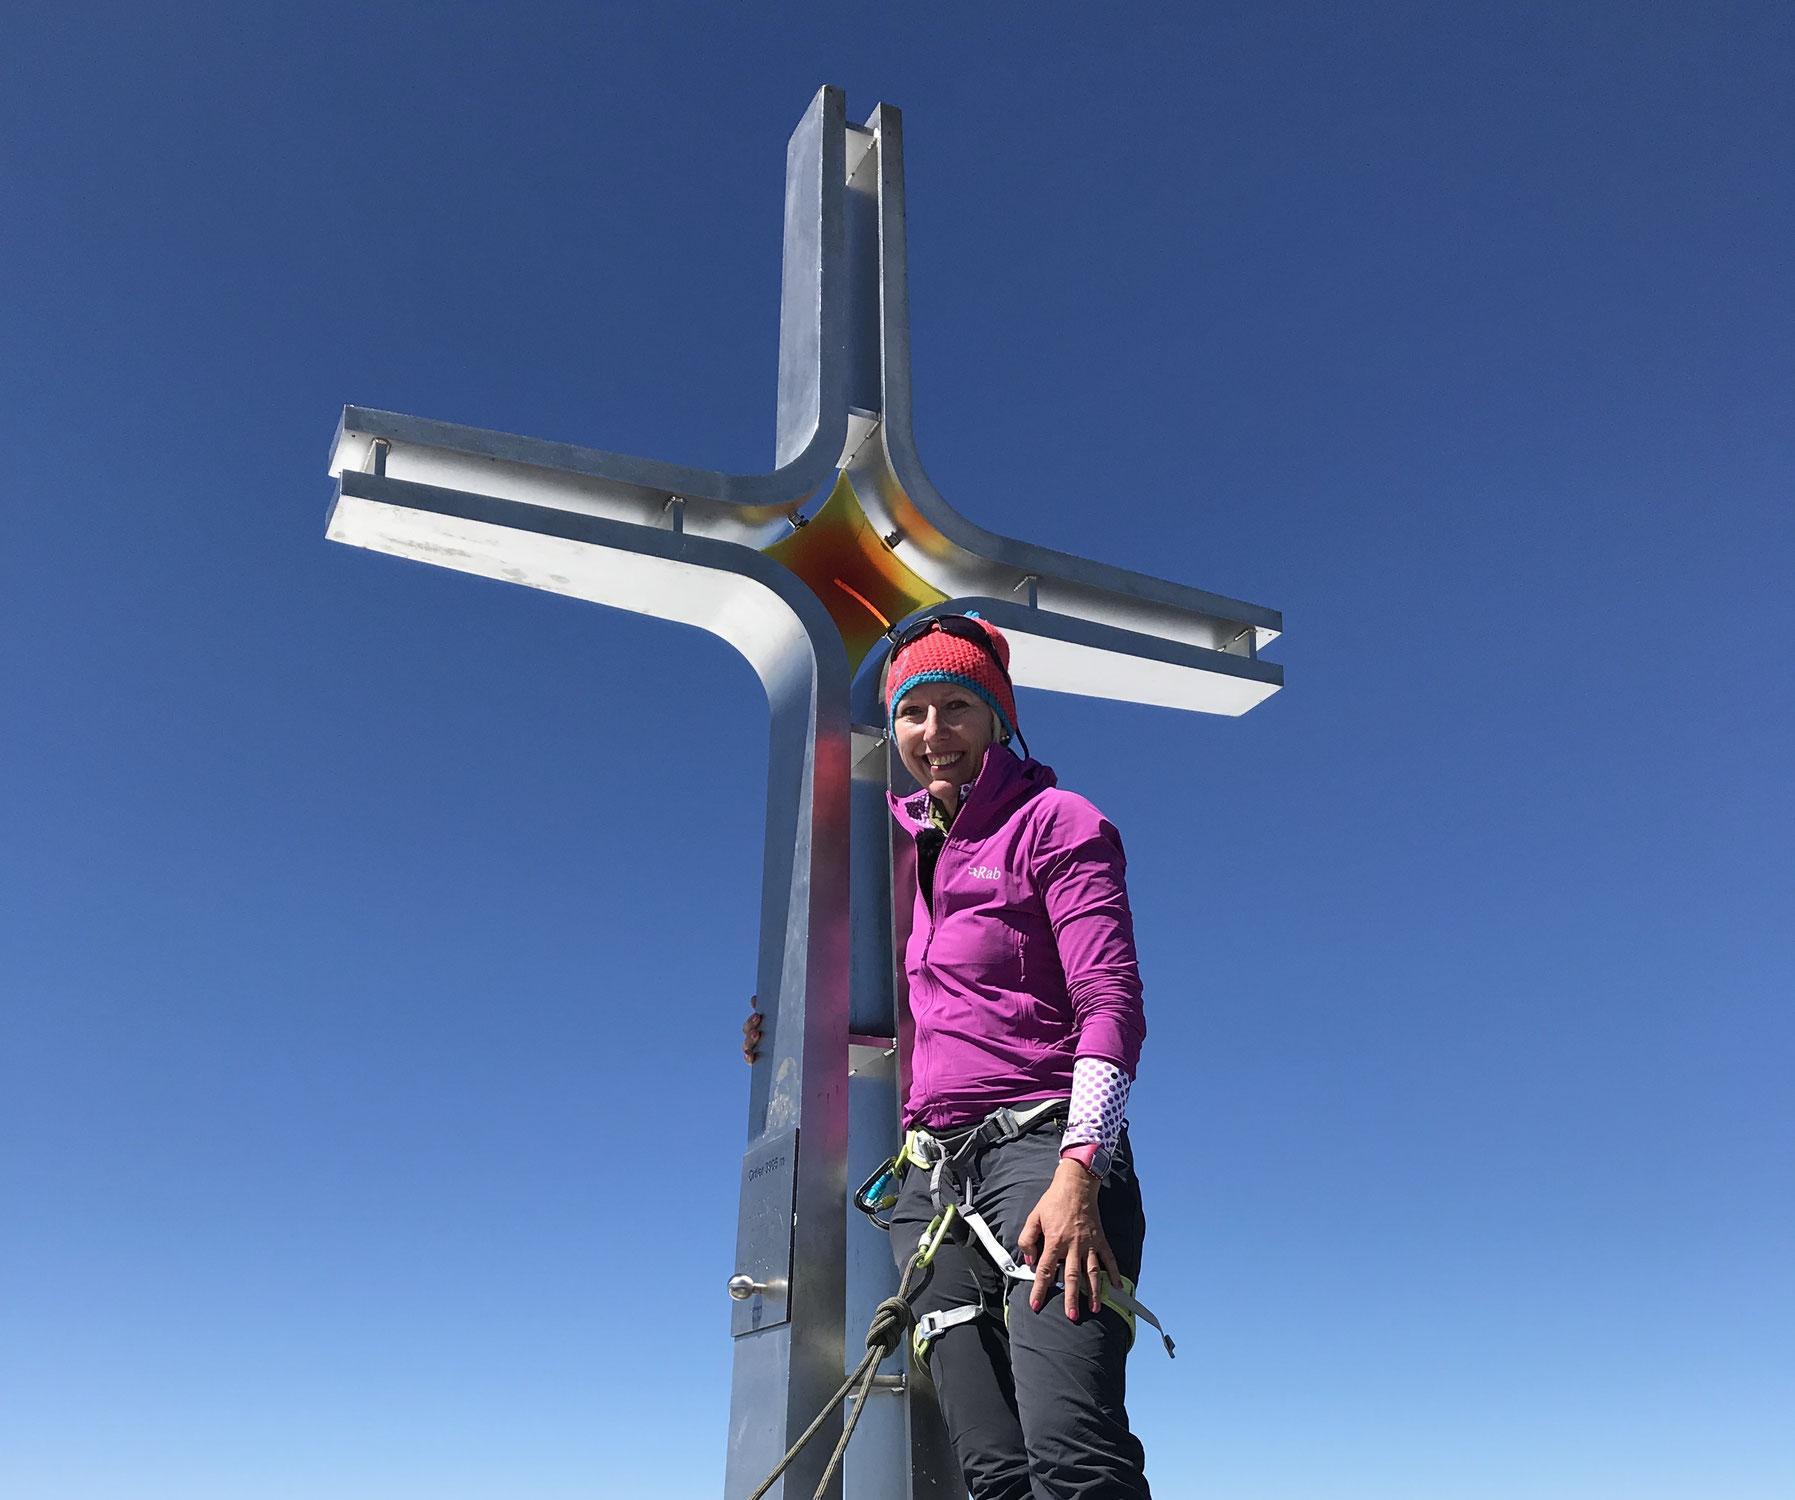 Endloses Gipfelglück: König Ortler - mein Sehnsuchtsberg